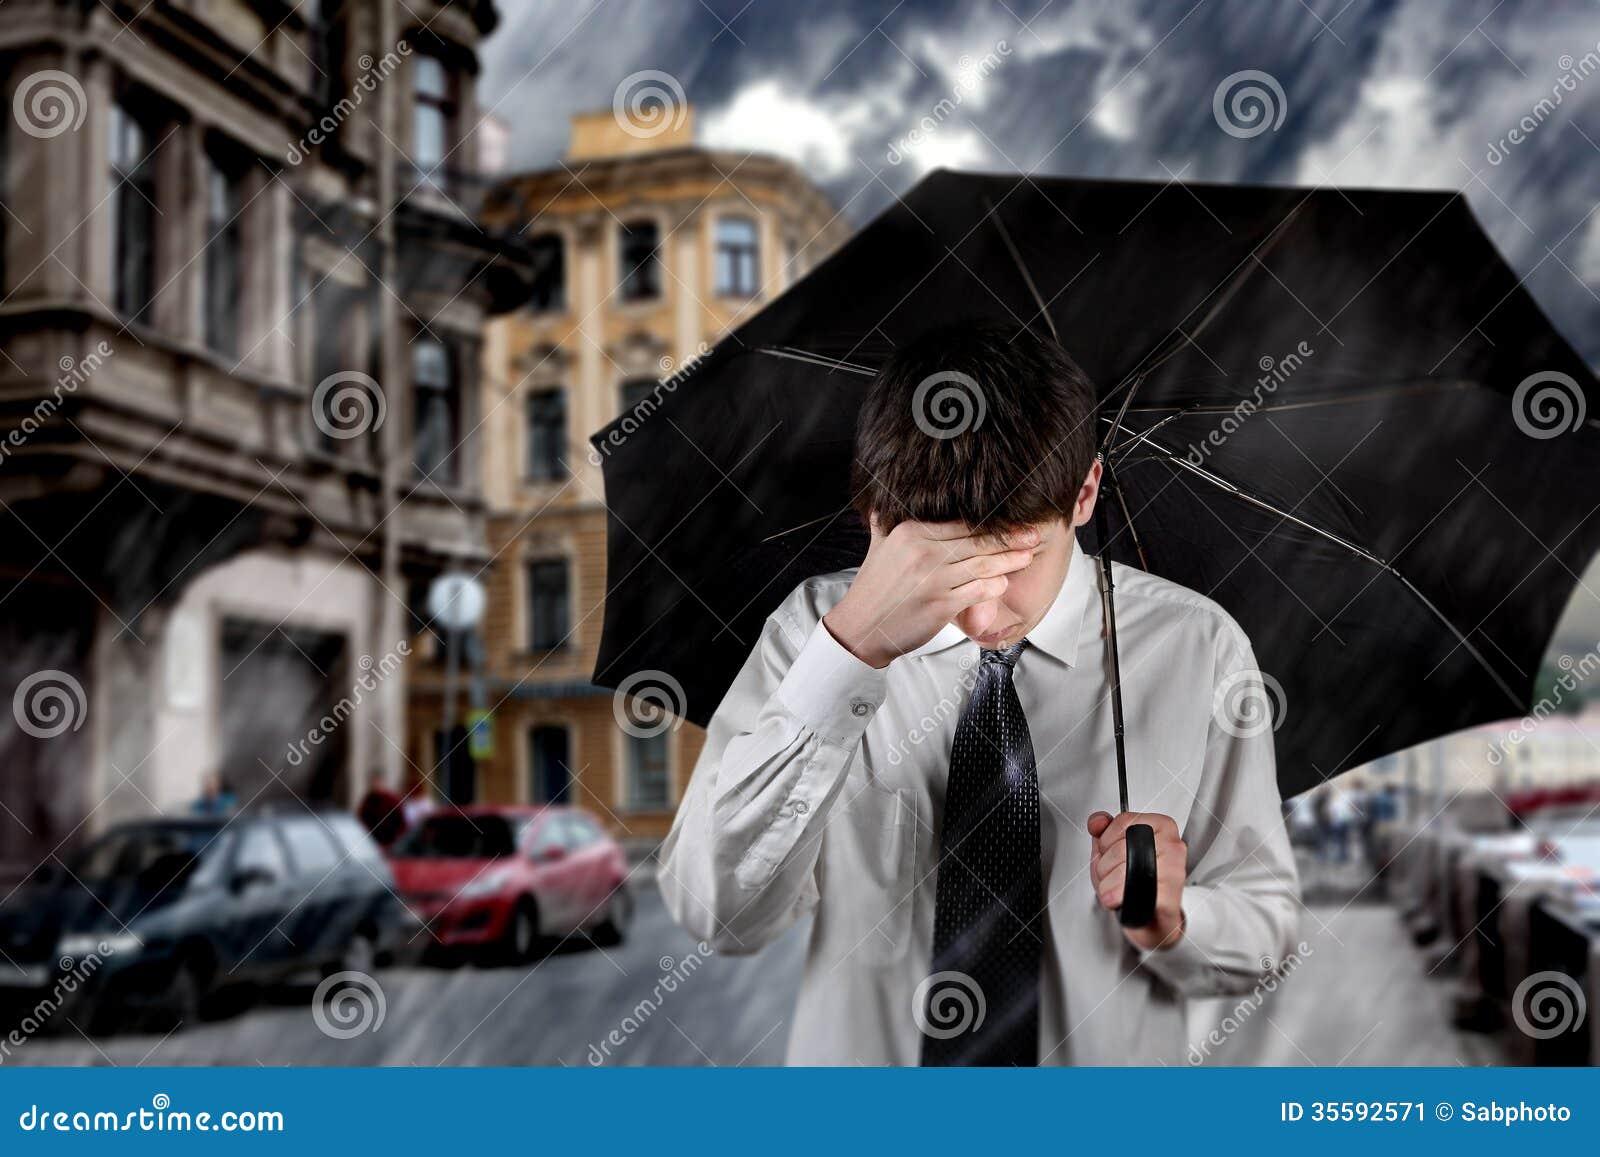 Sad Man Under The Rain Stock Image - Image: 35592571